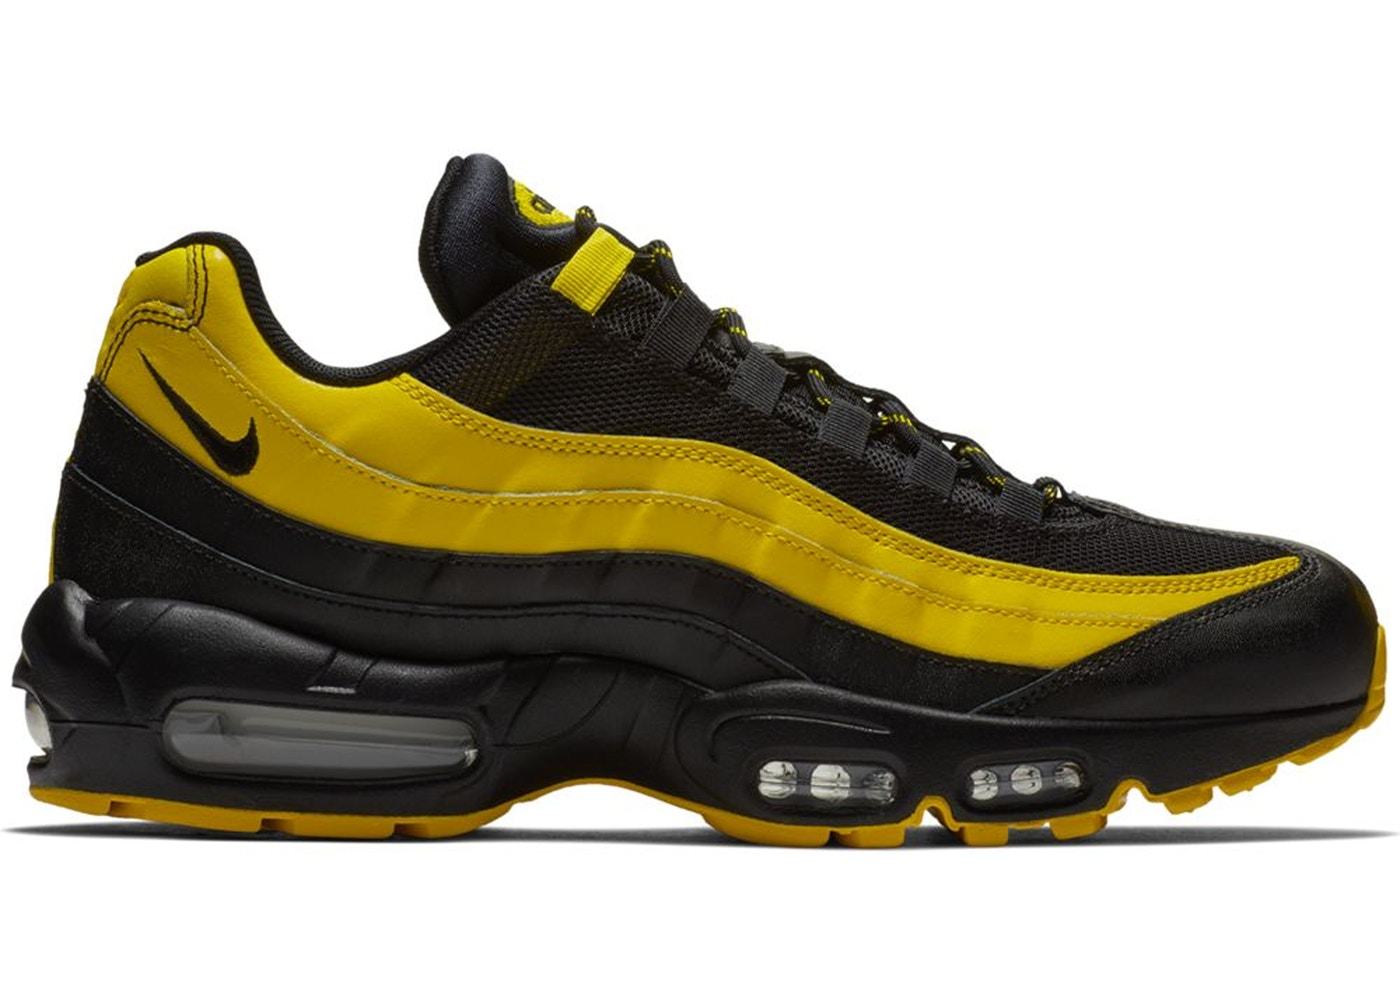 wholesale dealer 3654f cea0b Buy Nike Air Max 95 Shoes & Deadstock Sneakers